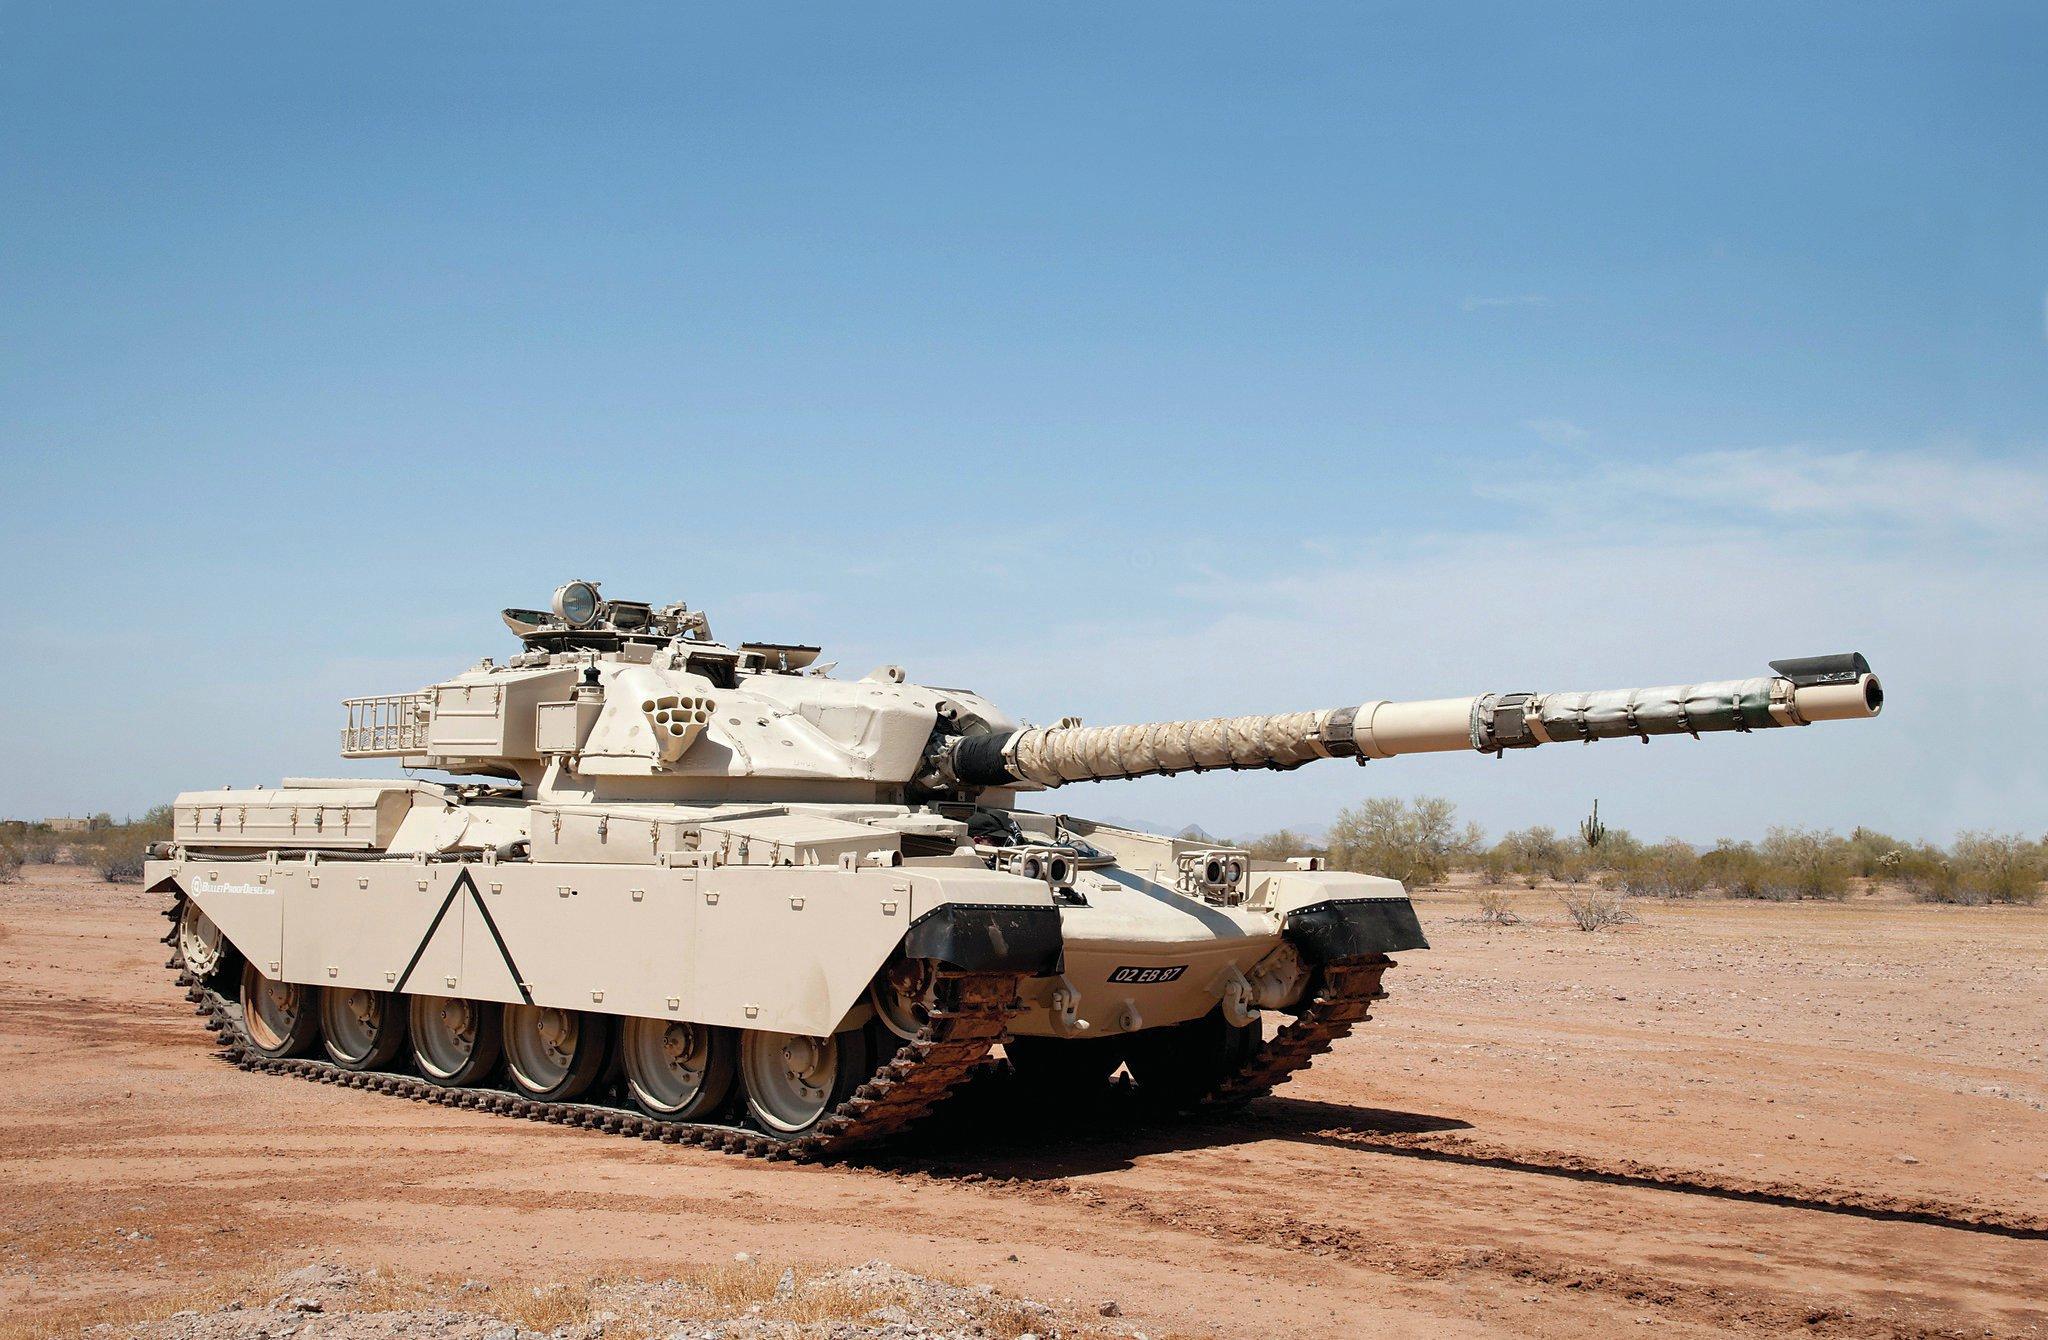 Chieftain tank and FV432 APC - Big Boy Toys Photo & Image Gallery